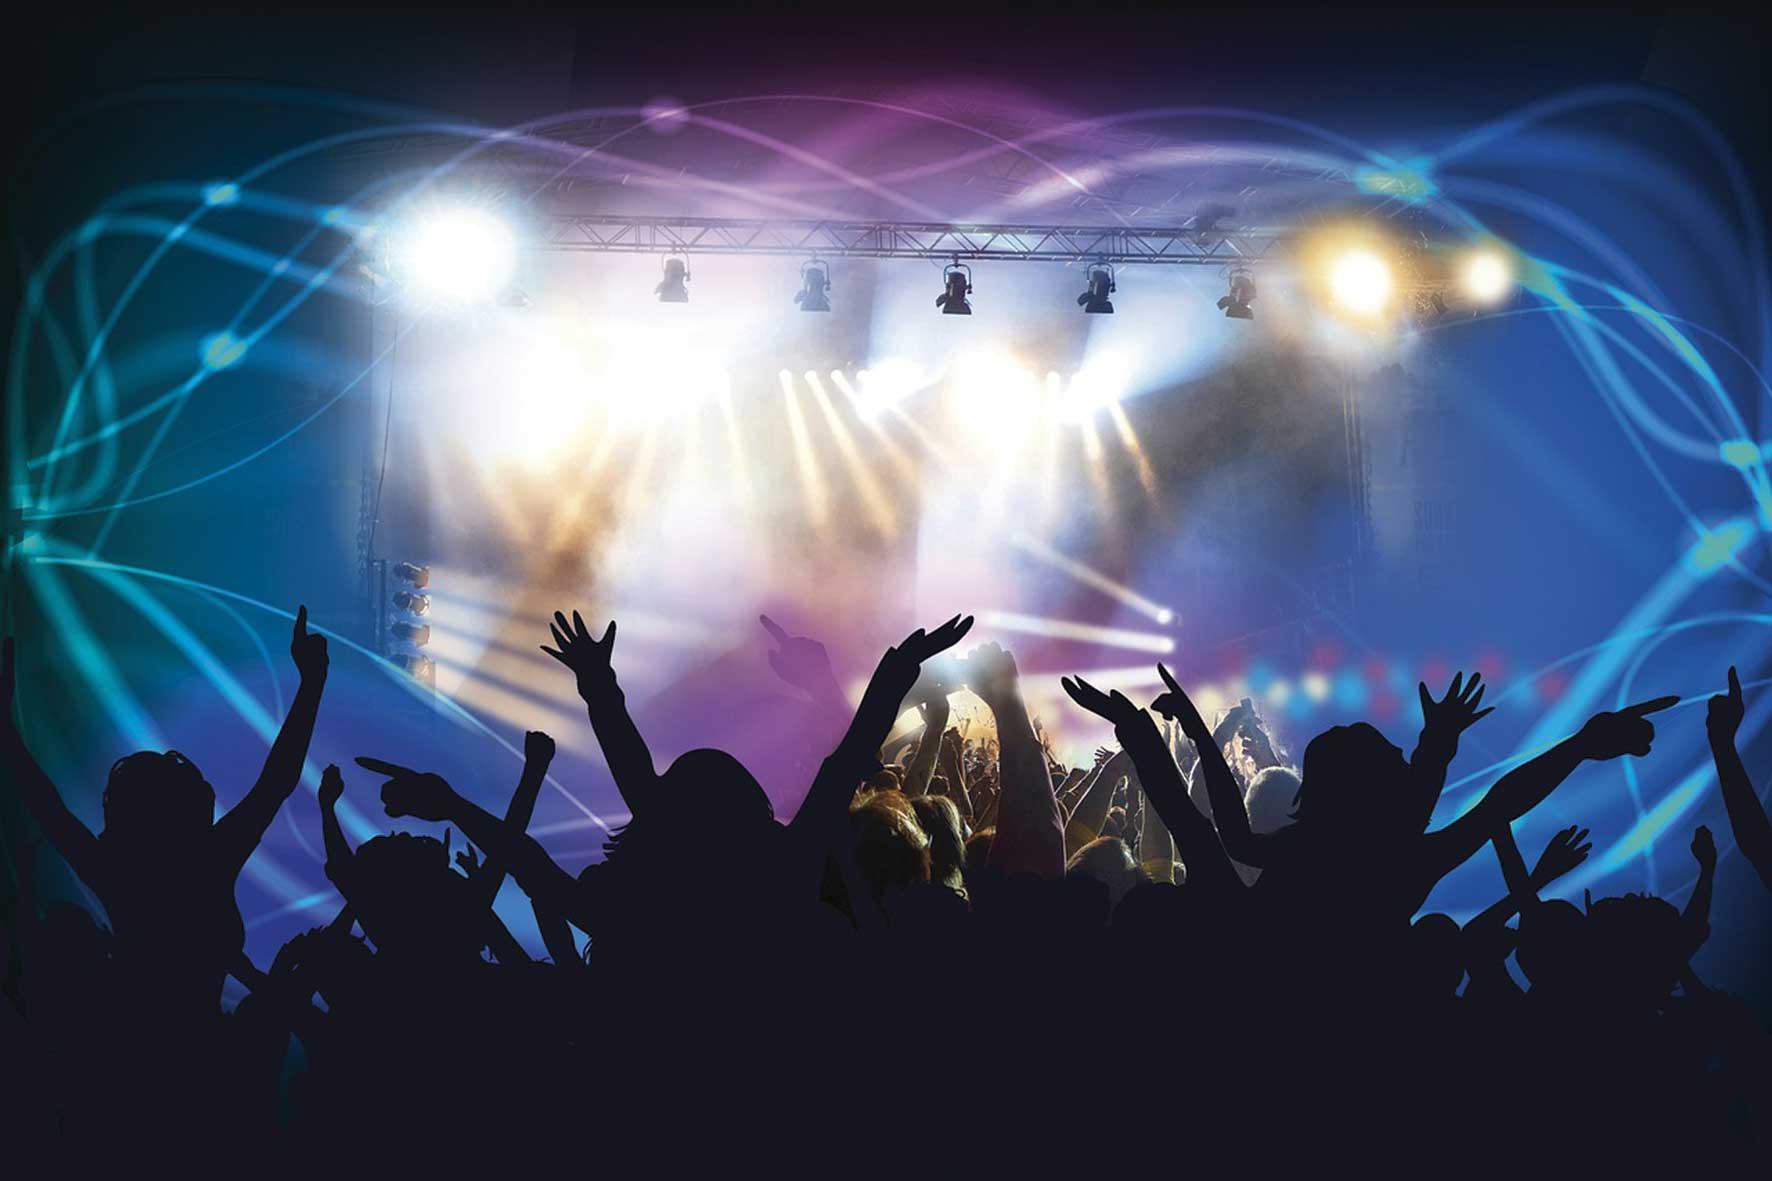 live-concert-388160 1280